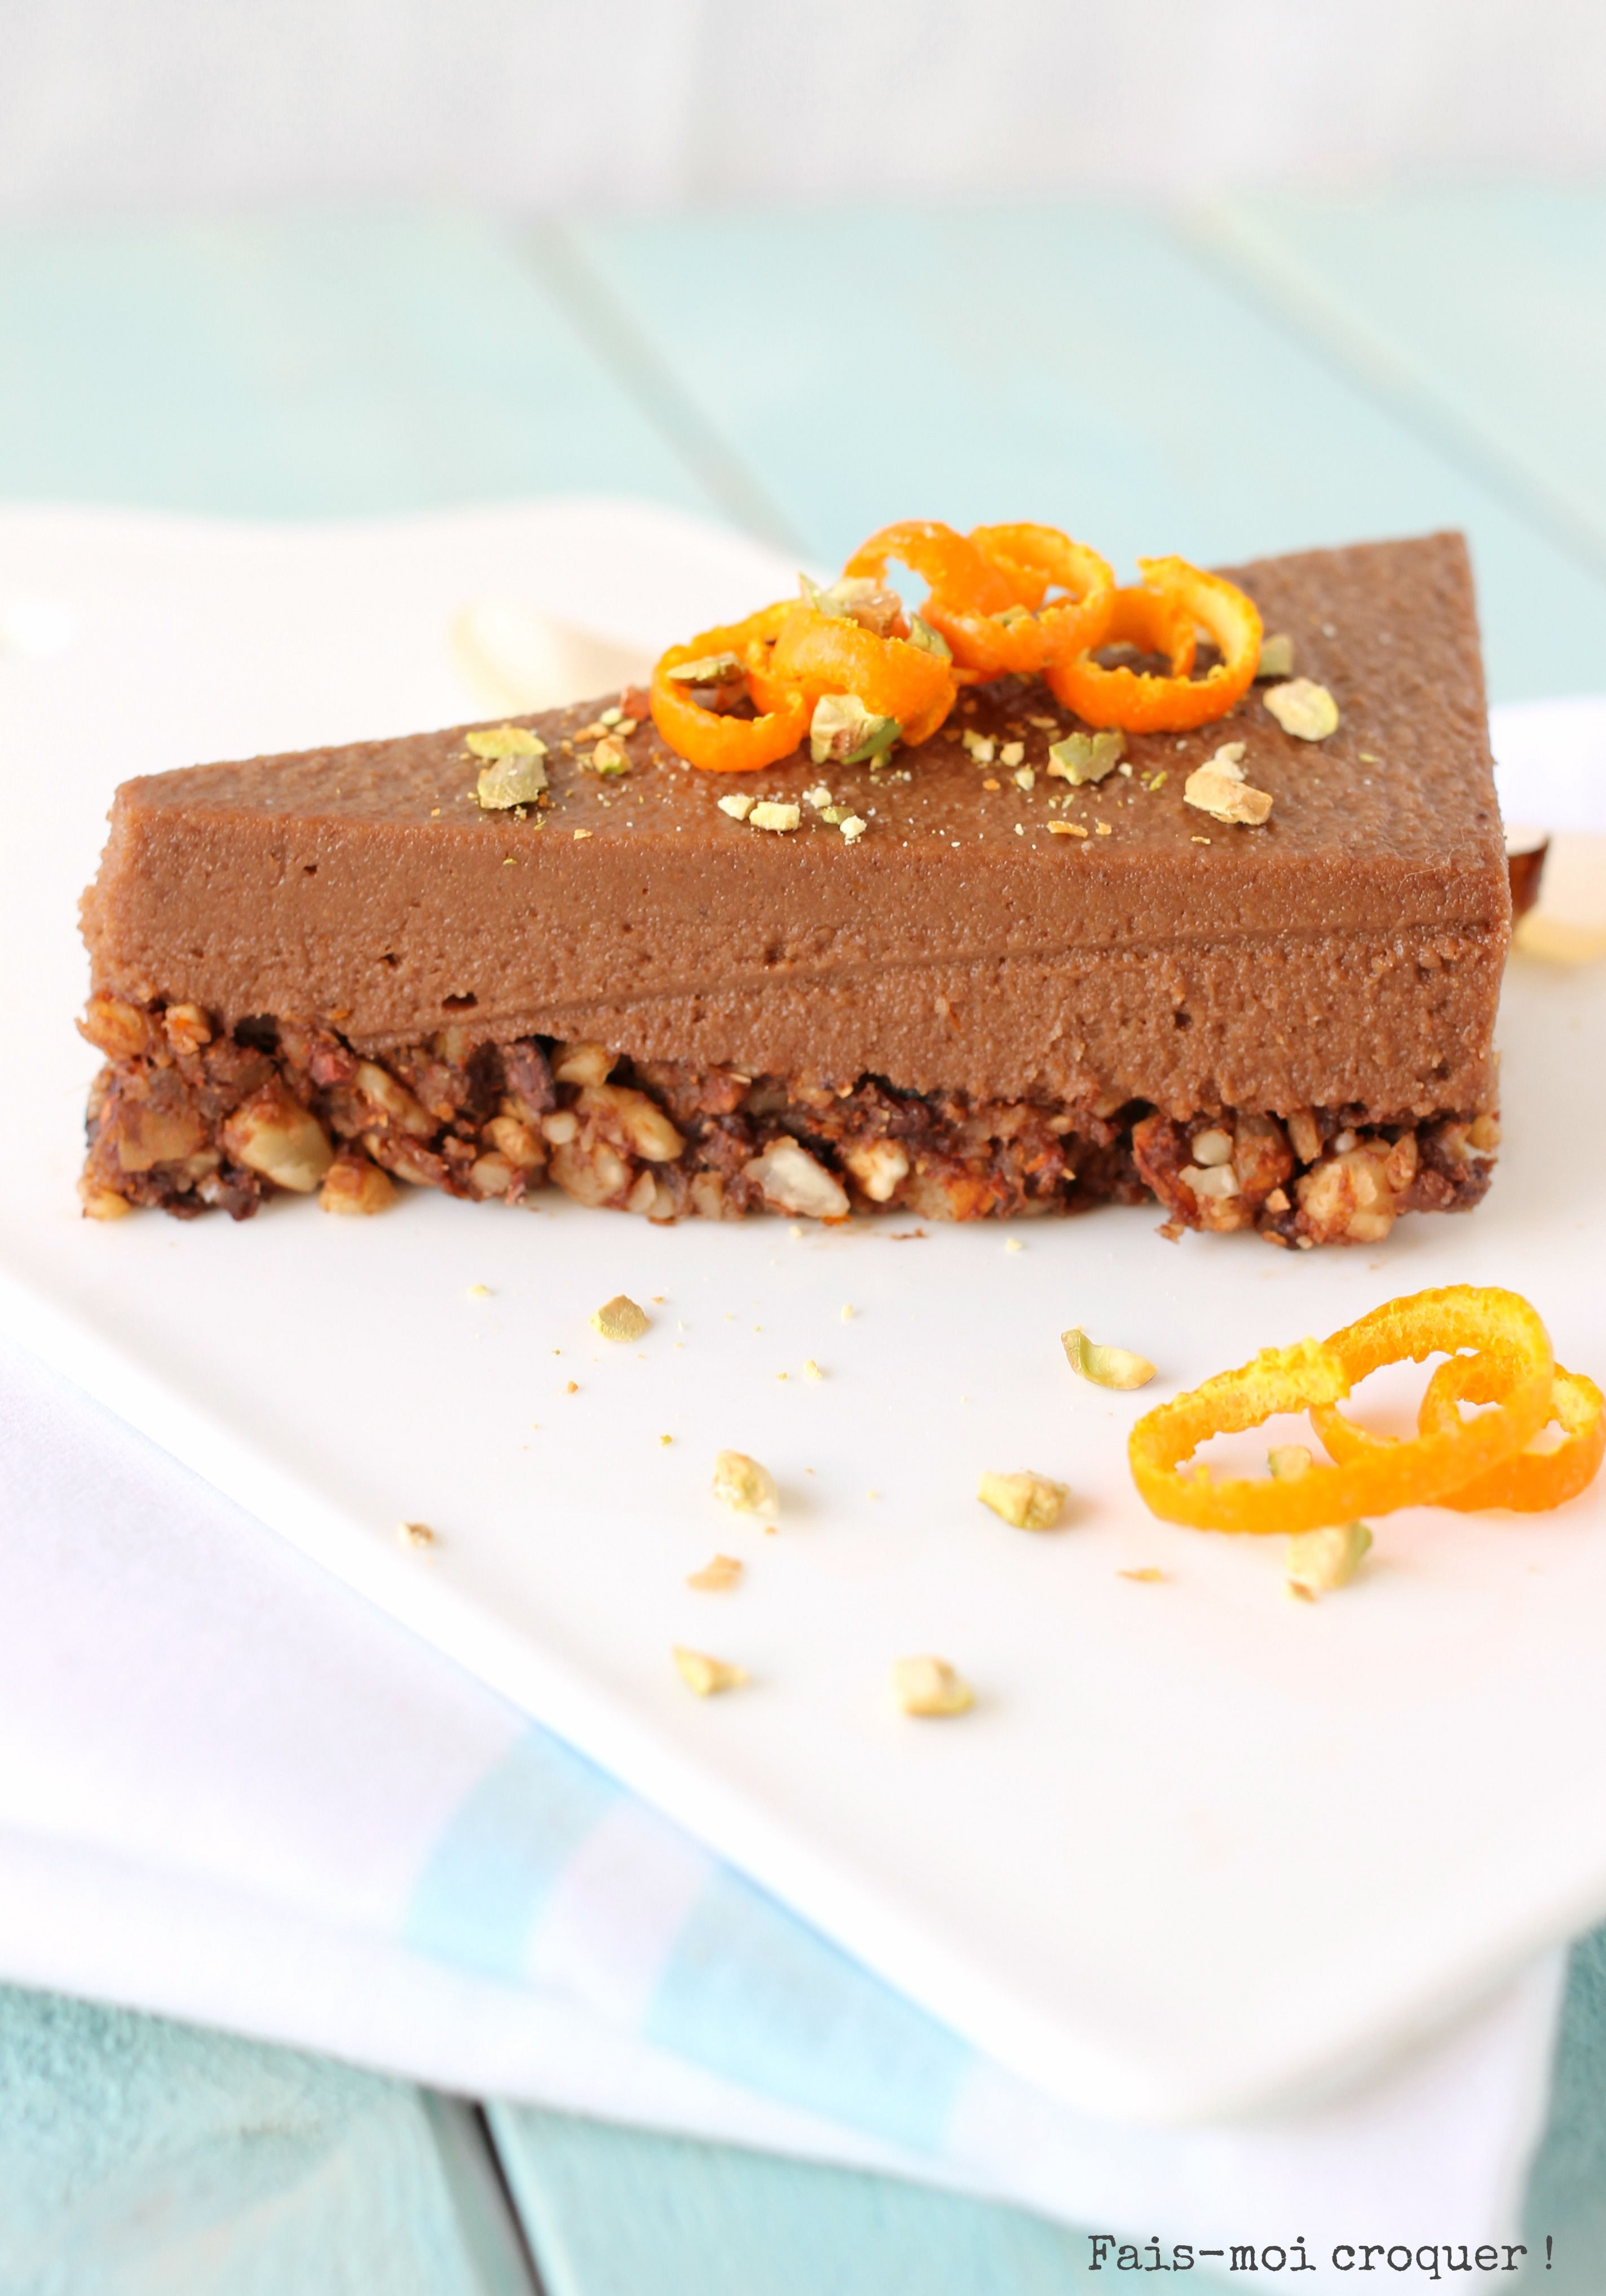 No Cheesecake Cru Chocolat Orange Vegan Raw Food Fais Moi Croquer Recette Gateau Cru Chocolat Orange Chocolat Brut